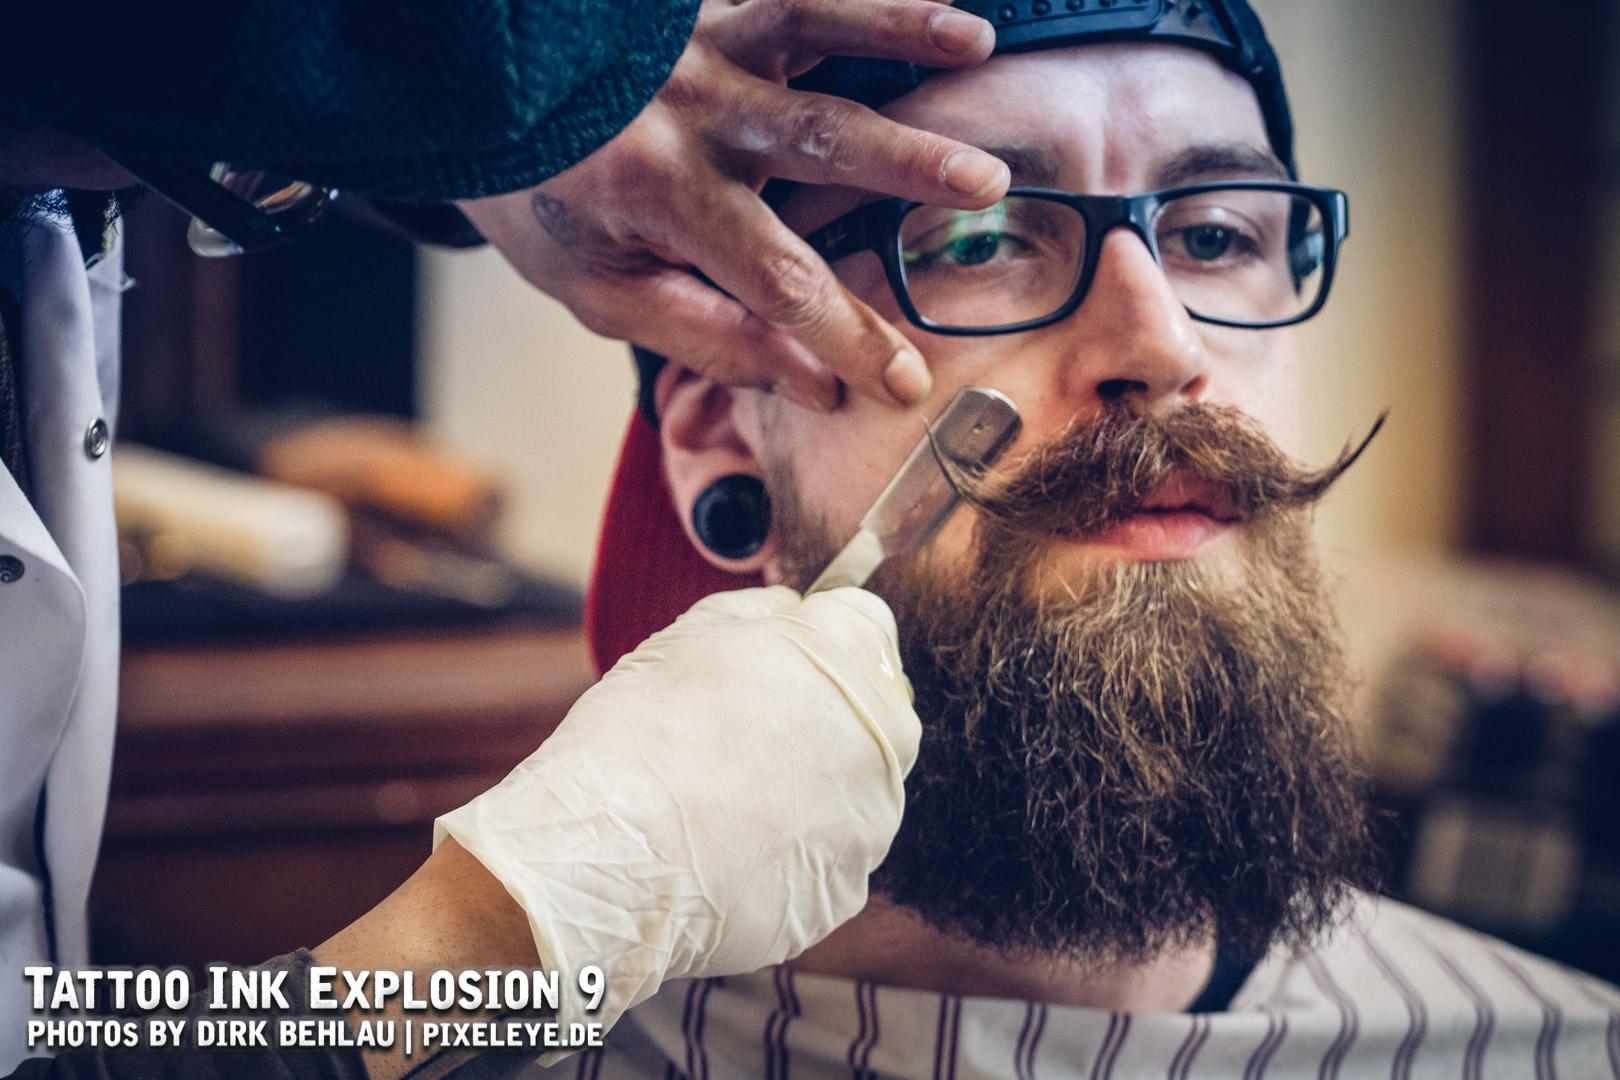 Tattoo Ink Explosion 2018 WEB by Dirk Behlau-1443.jpg